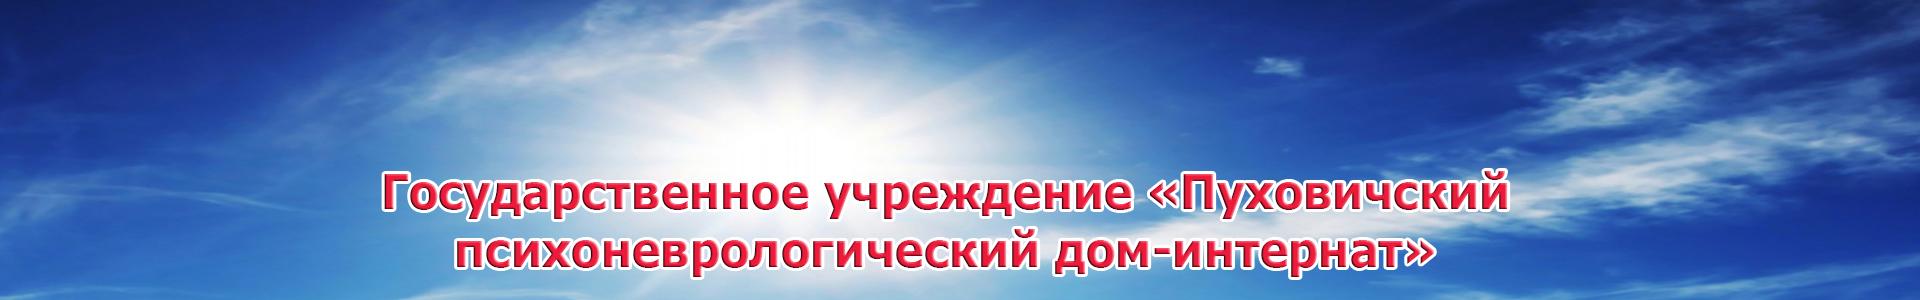 «Пуховичский психоневрологический дом-интернат»